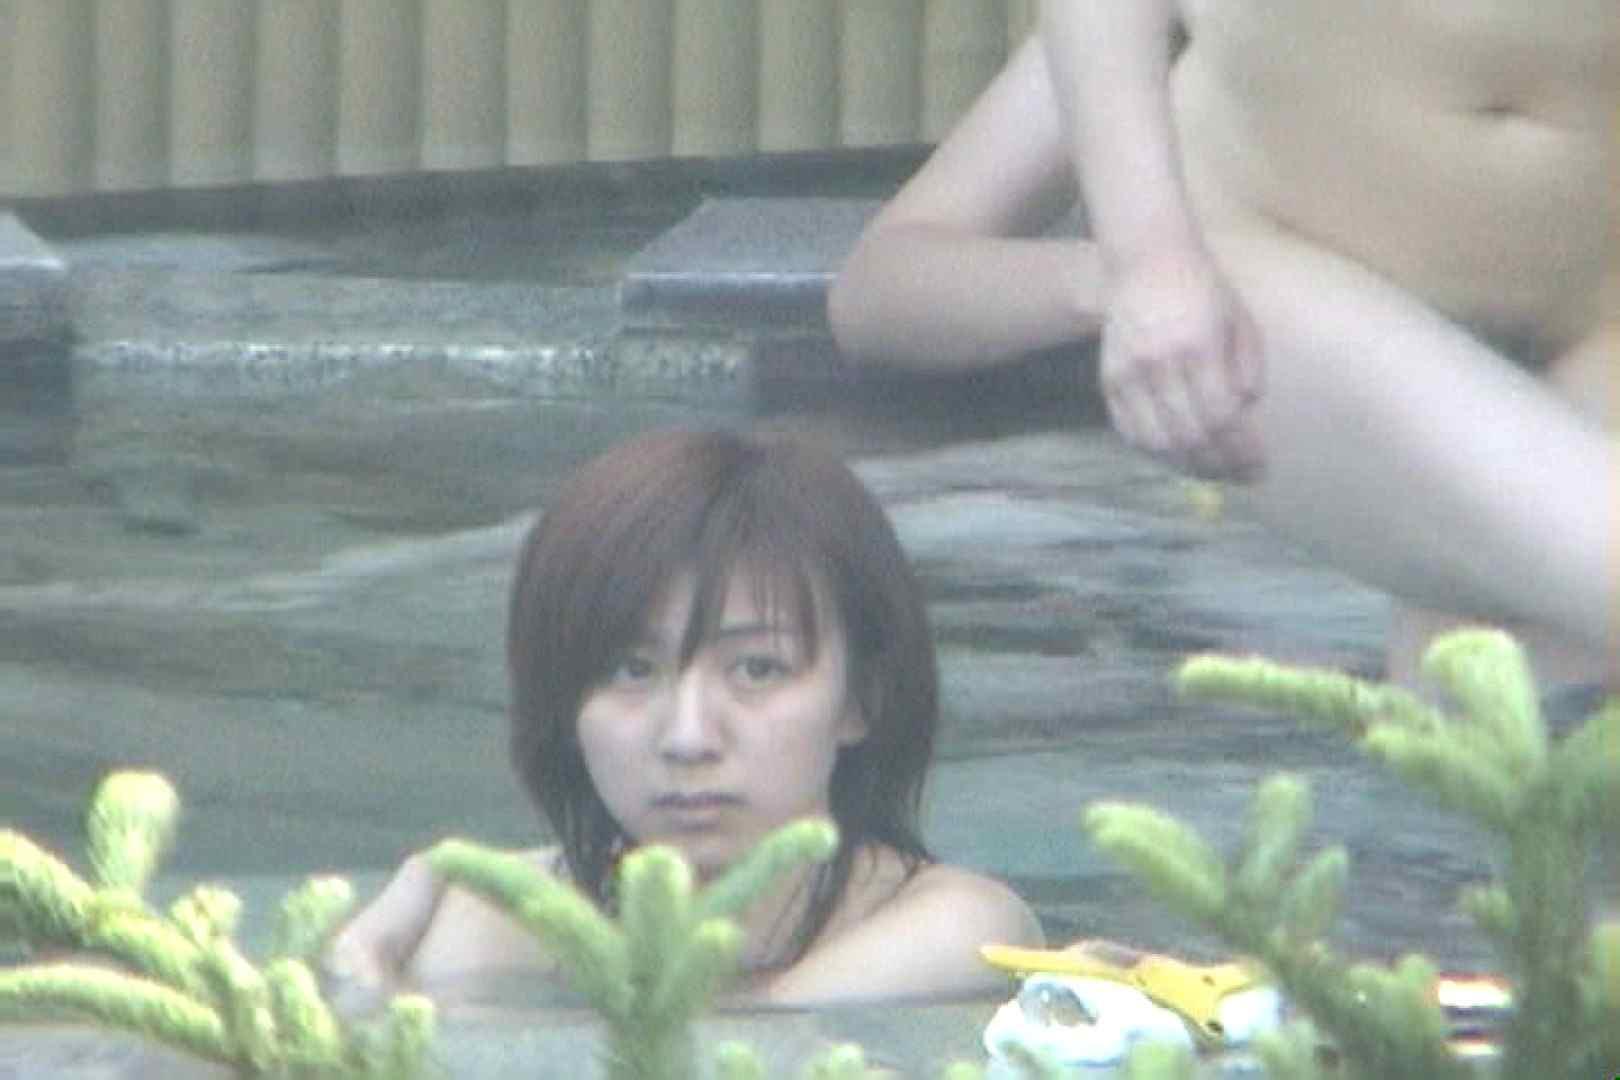 Aquaな露天風呂Vol.77【VIP限定】 盗撮   OLセックス  107画像 88